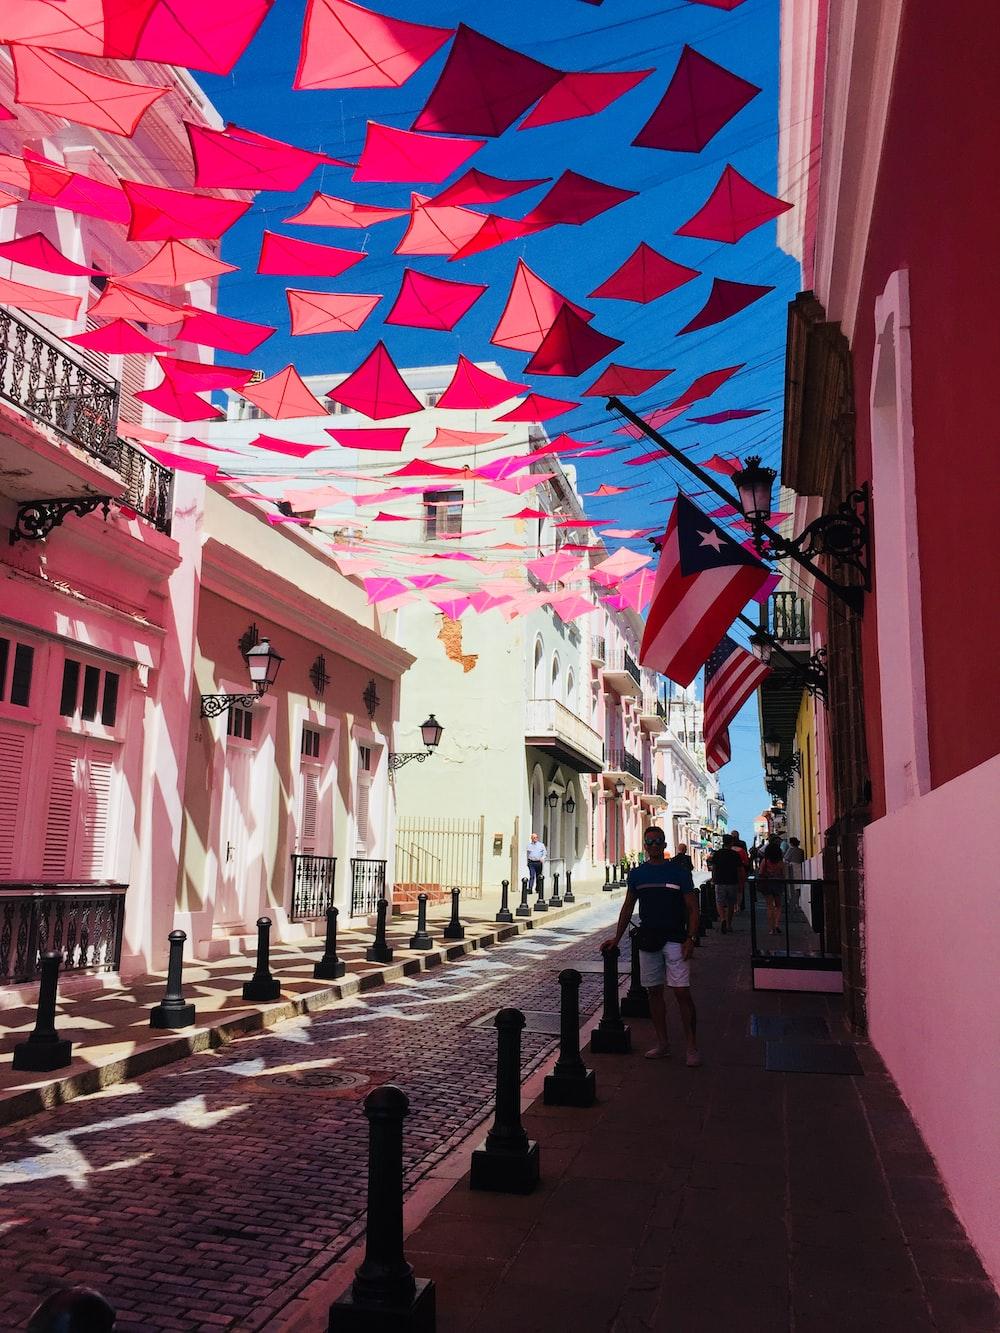 red kite pennants on street